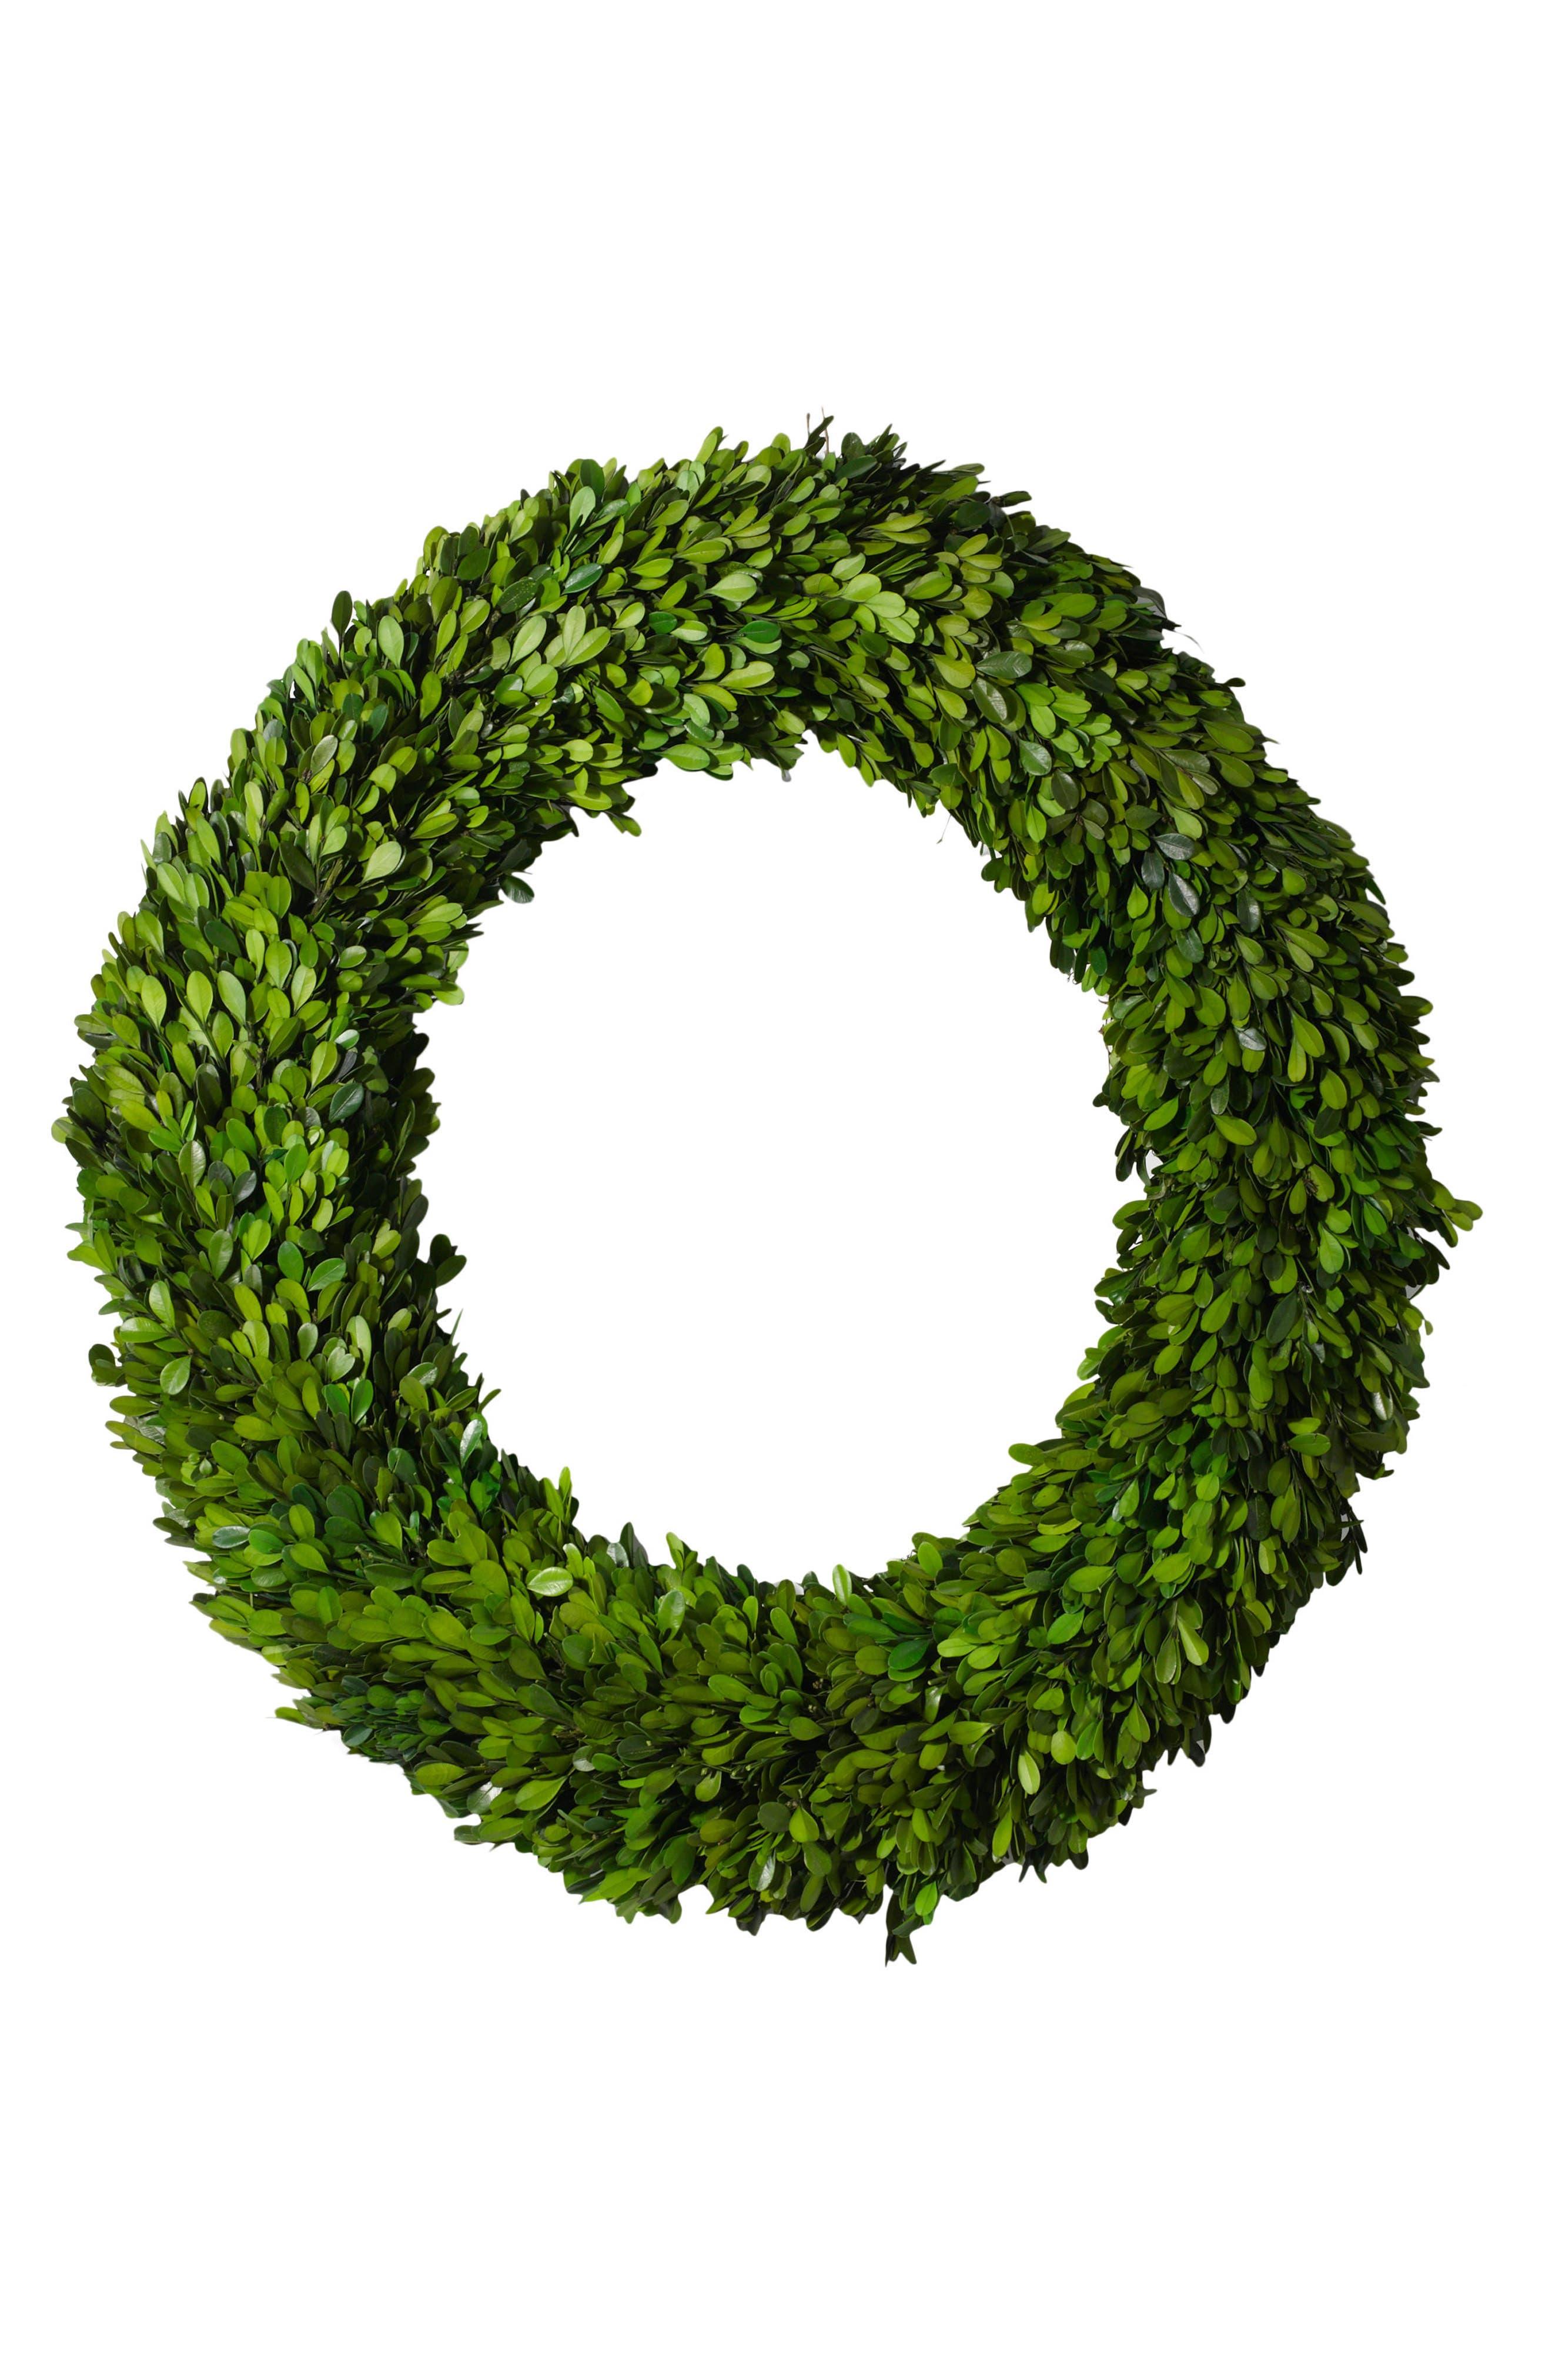 Main Image - Accent Decor Boxwood Wreath